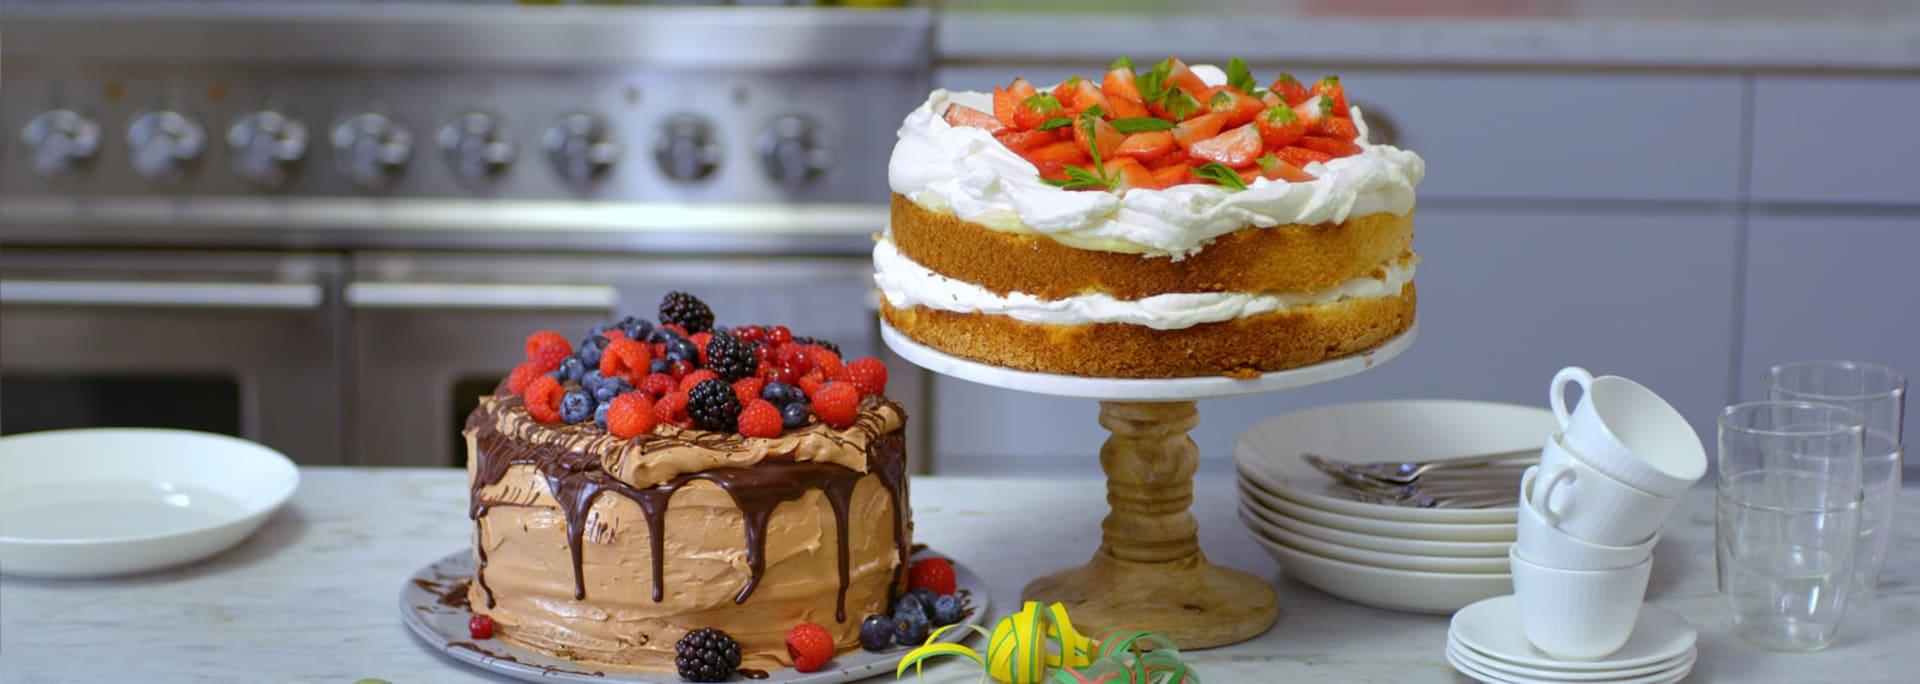 Glutenfri chokladtårta och glutenfri gräddtårta med jordgubbar